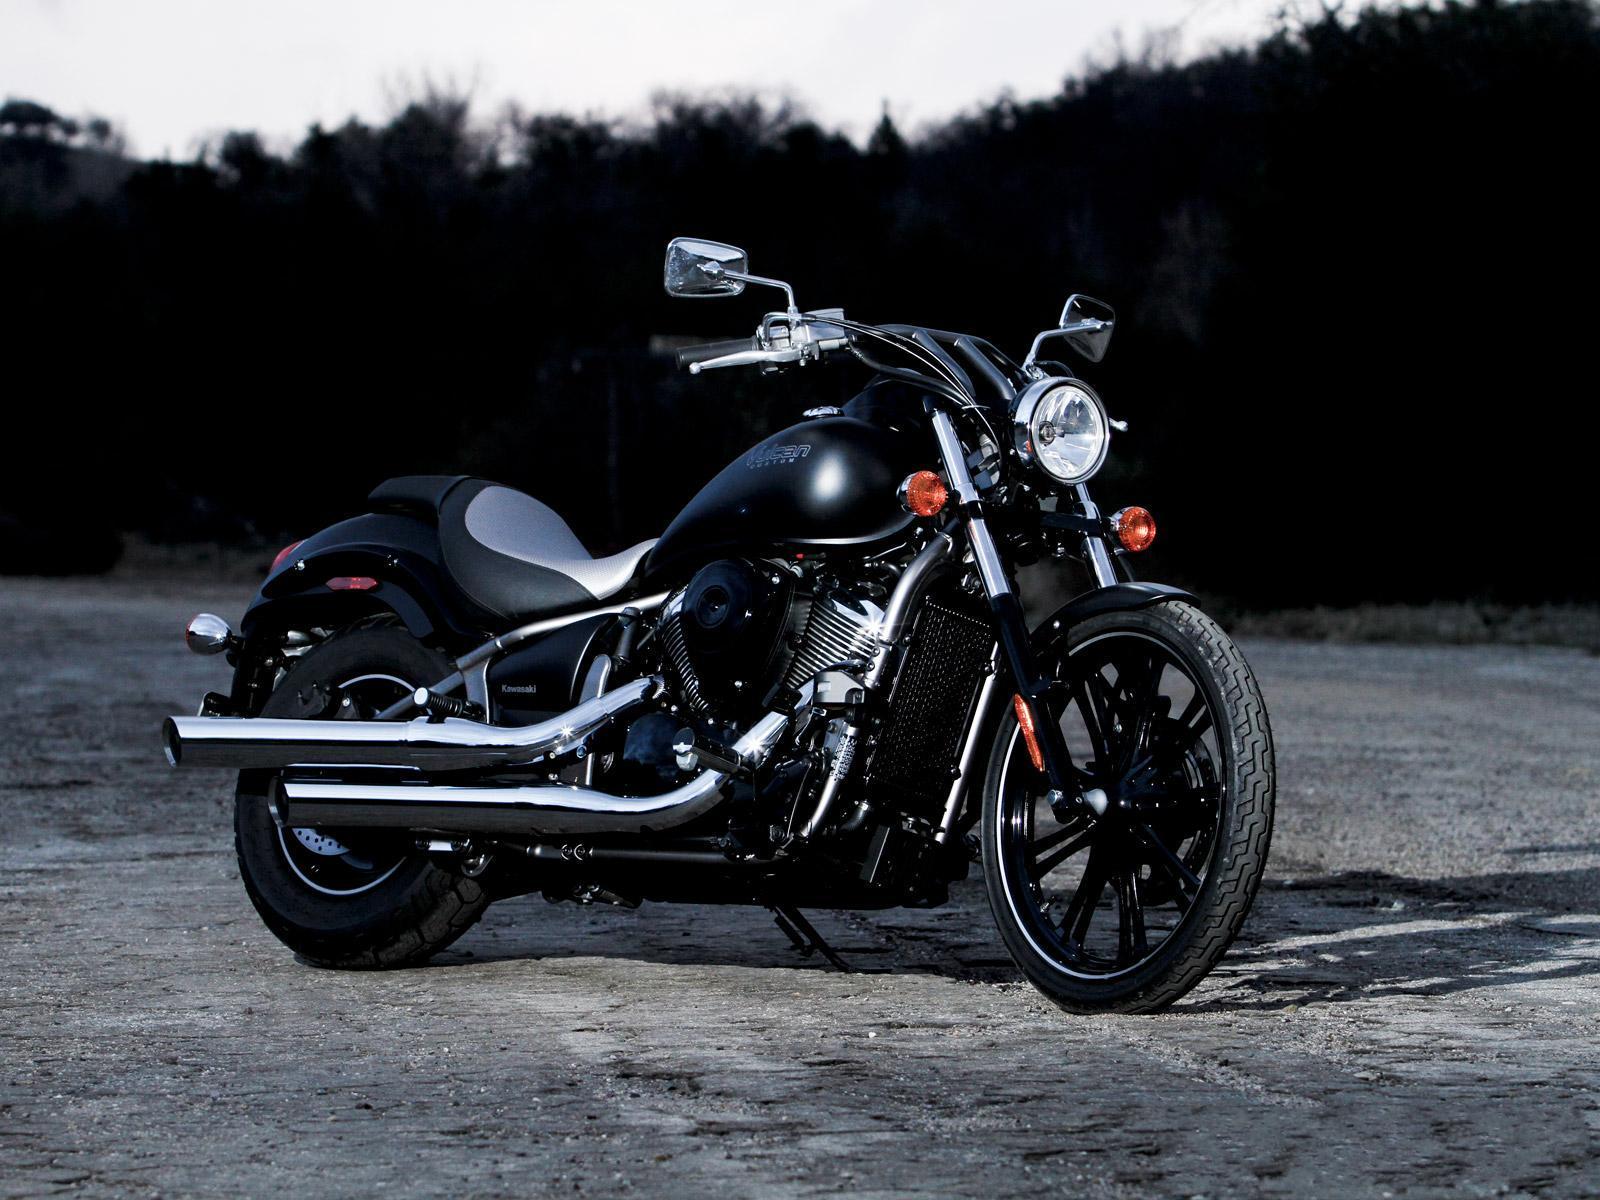 Honda City Car Hd Wallpaper Download Black Bike Pictures Hd 33152 1600x1200px